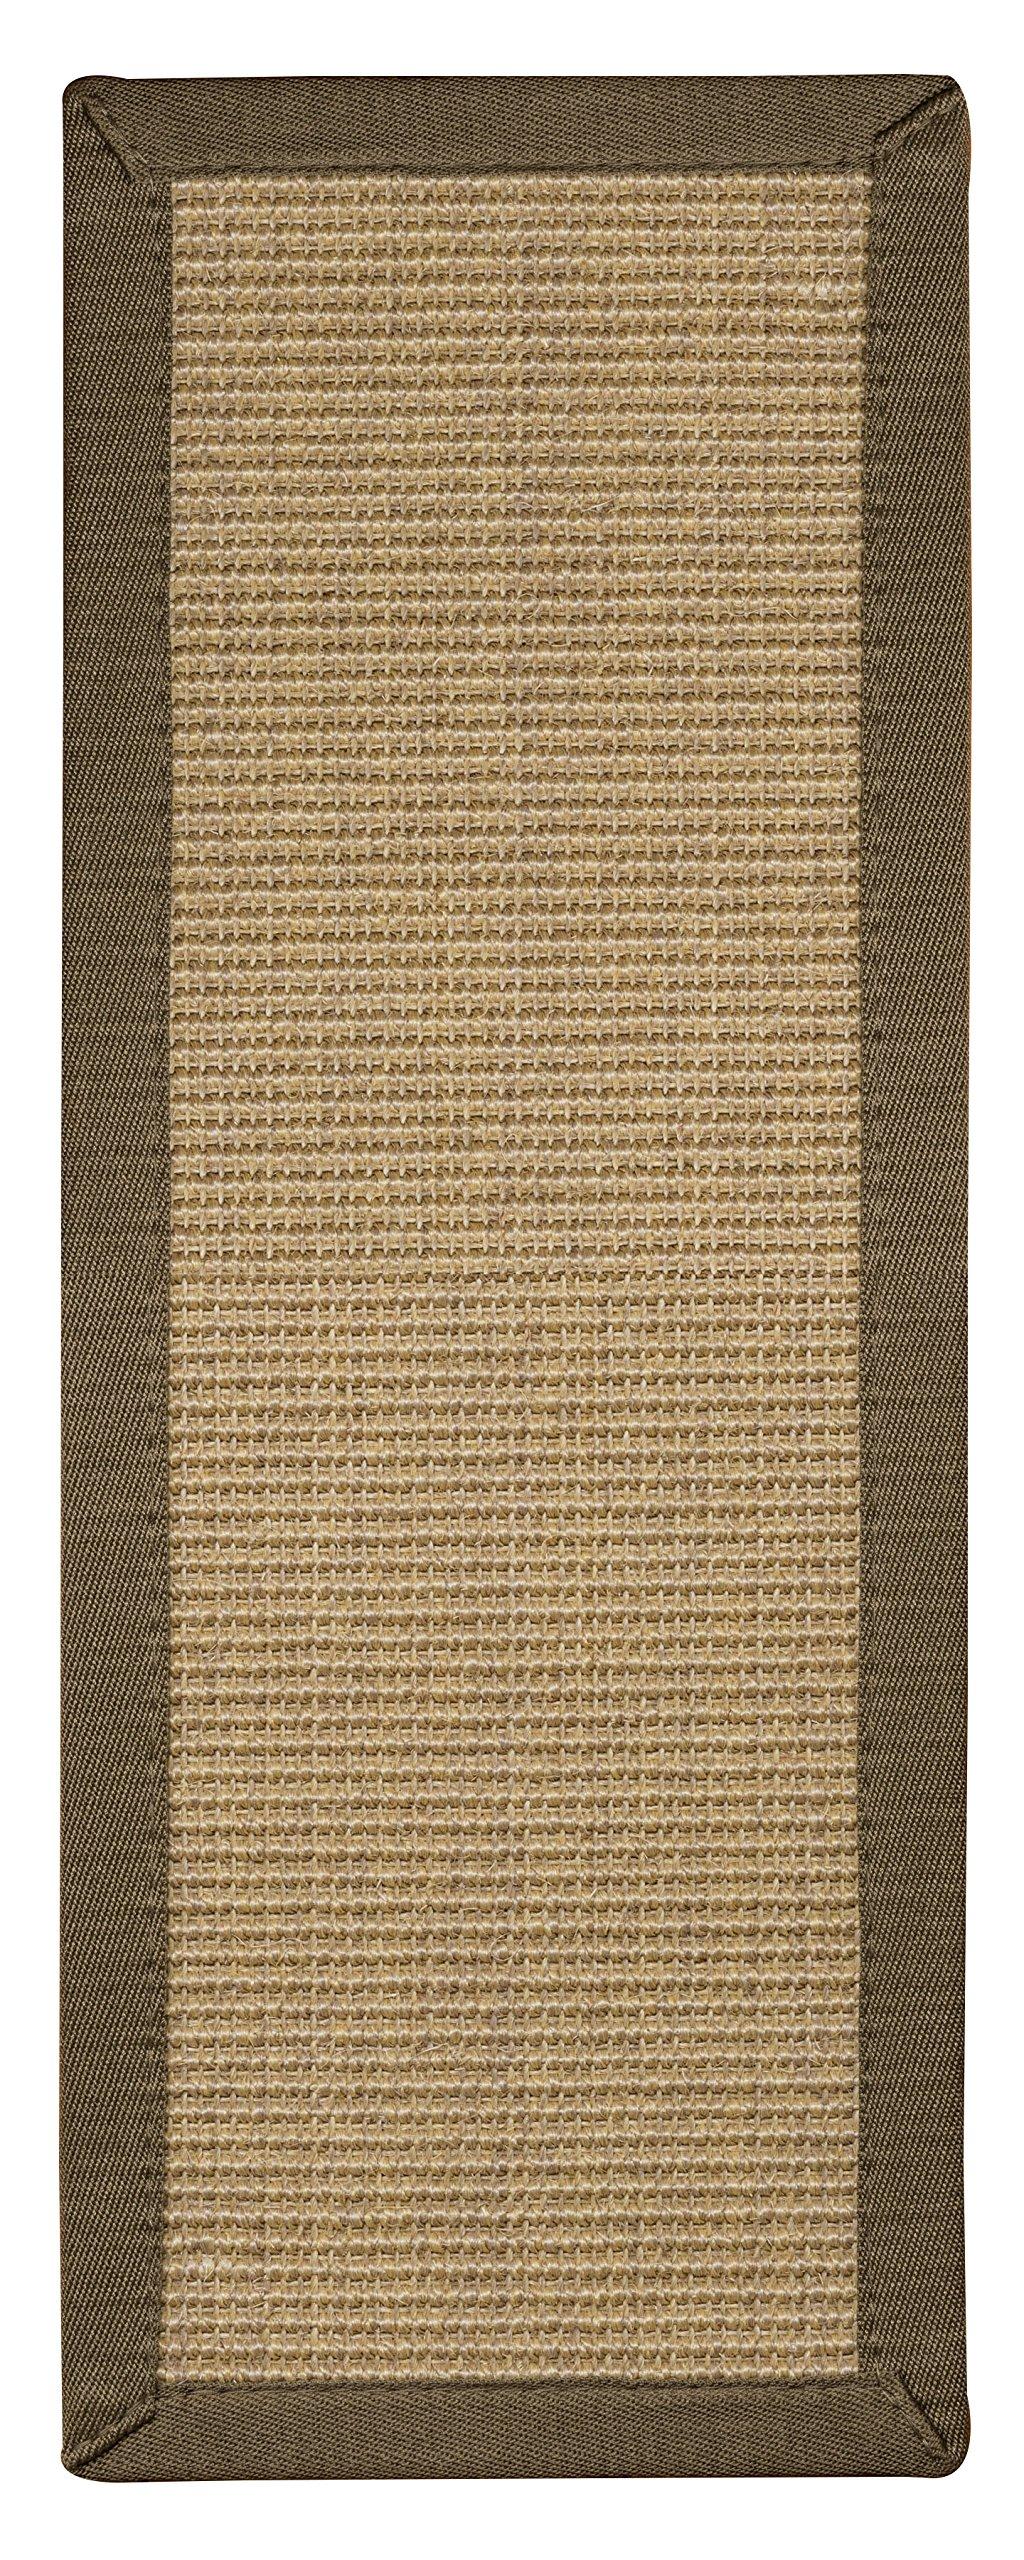 NaturalAreaRugs Kinsley Sisal Carpet Stair Treads, 9-Inch by 29-Inch, Khaki